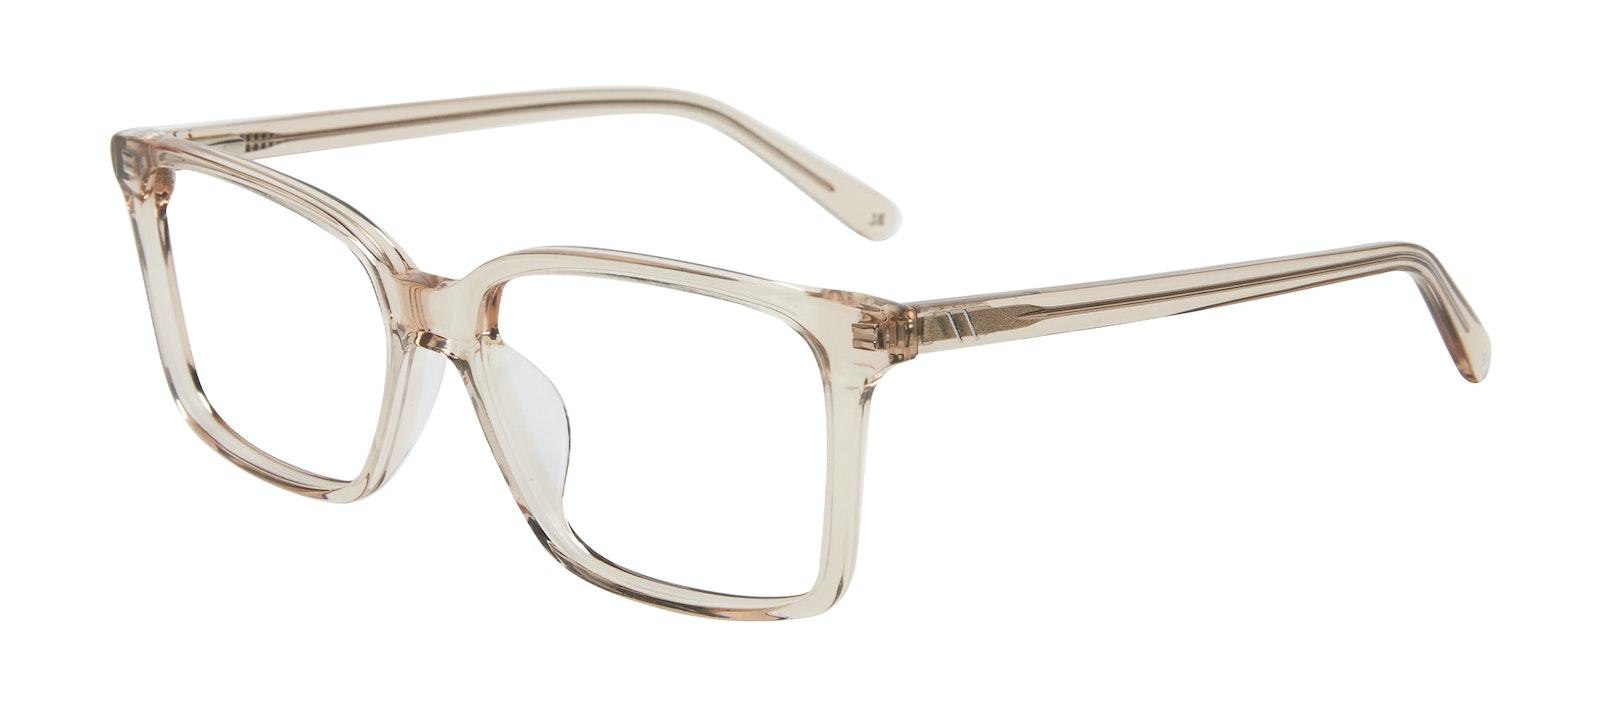 Affordable Fashion Glasses Square Eyeglasses Men Lapel Golden Tilt